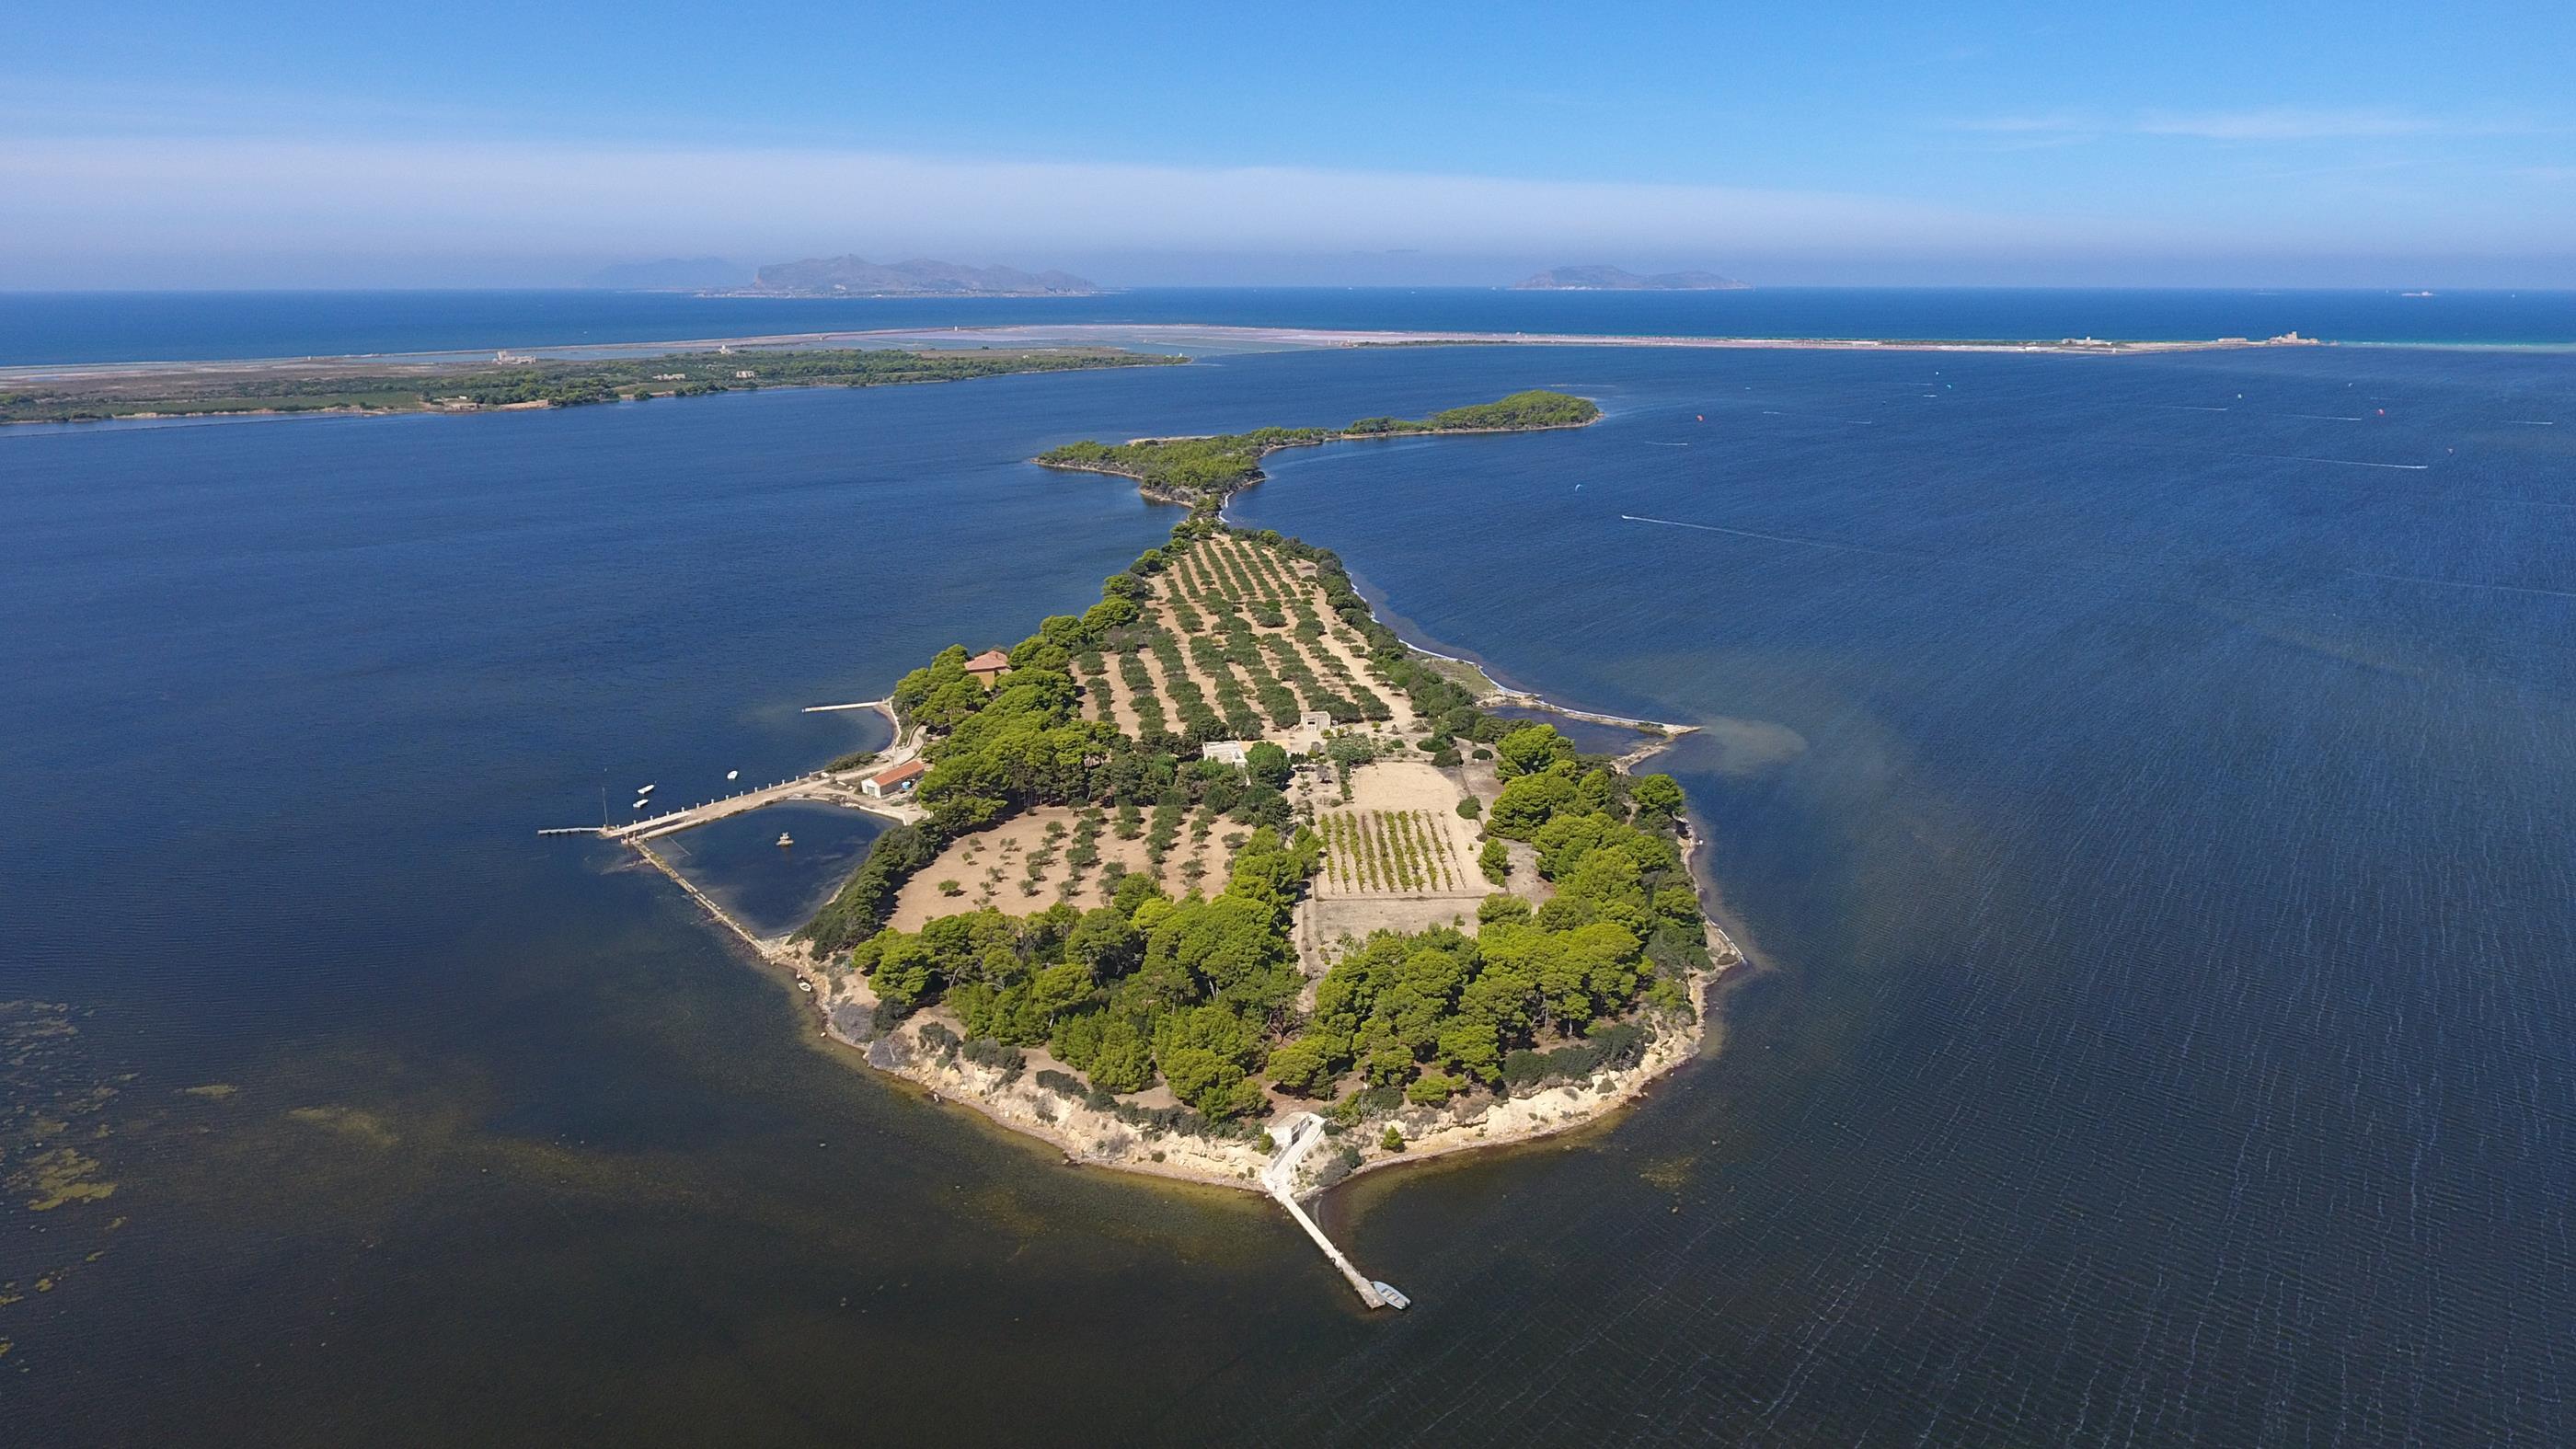 lo Stagnone lagoon Sicily kitesurfing spot